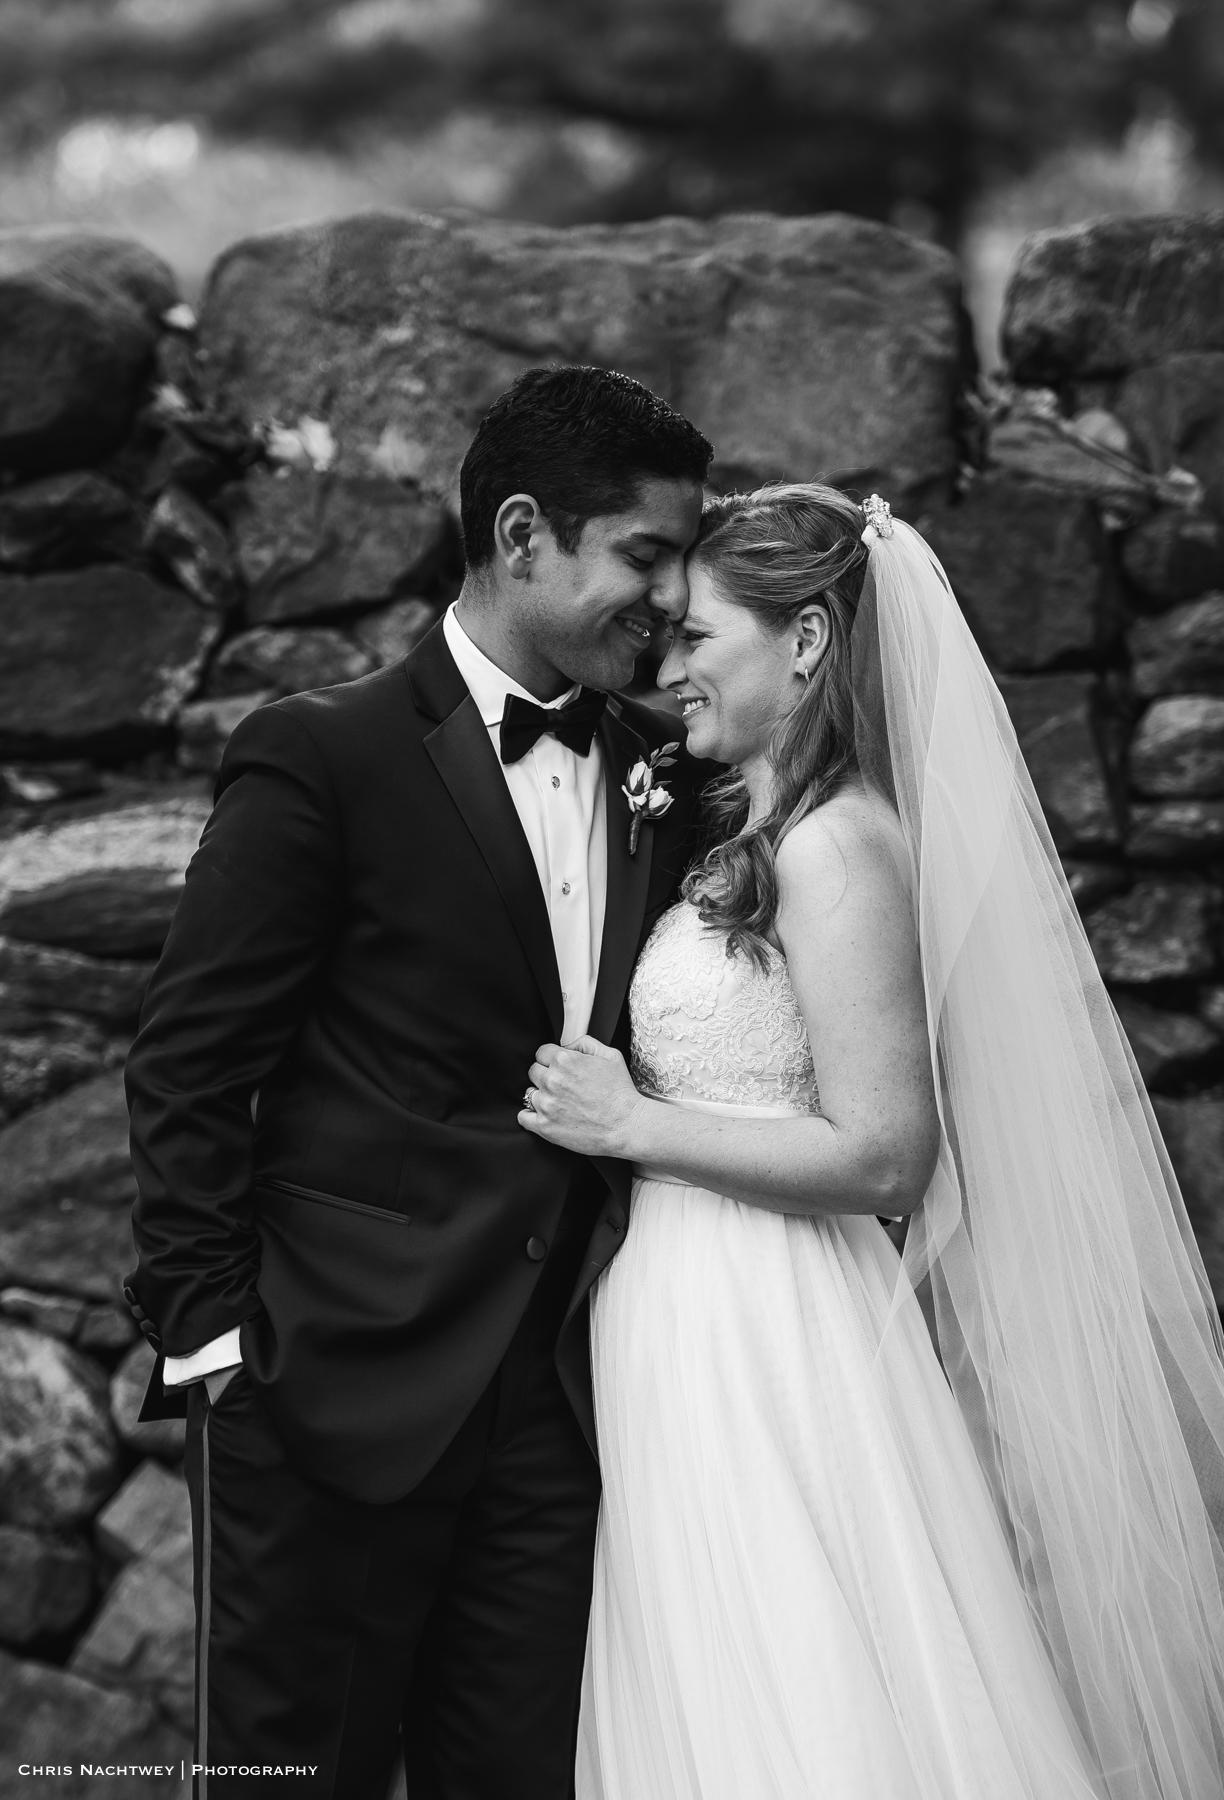 wedding-the-litchfield-inn-ct-photos-chris-nachtwey-photography-2018-24.jpg